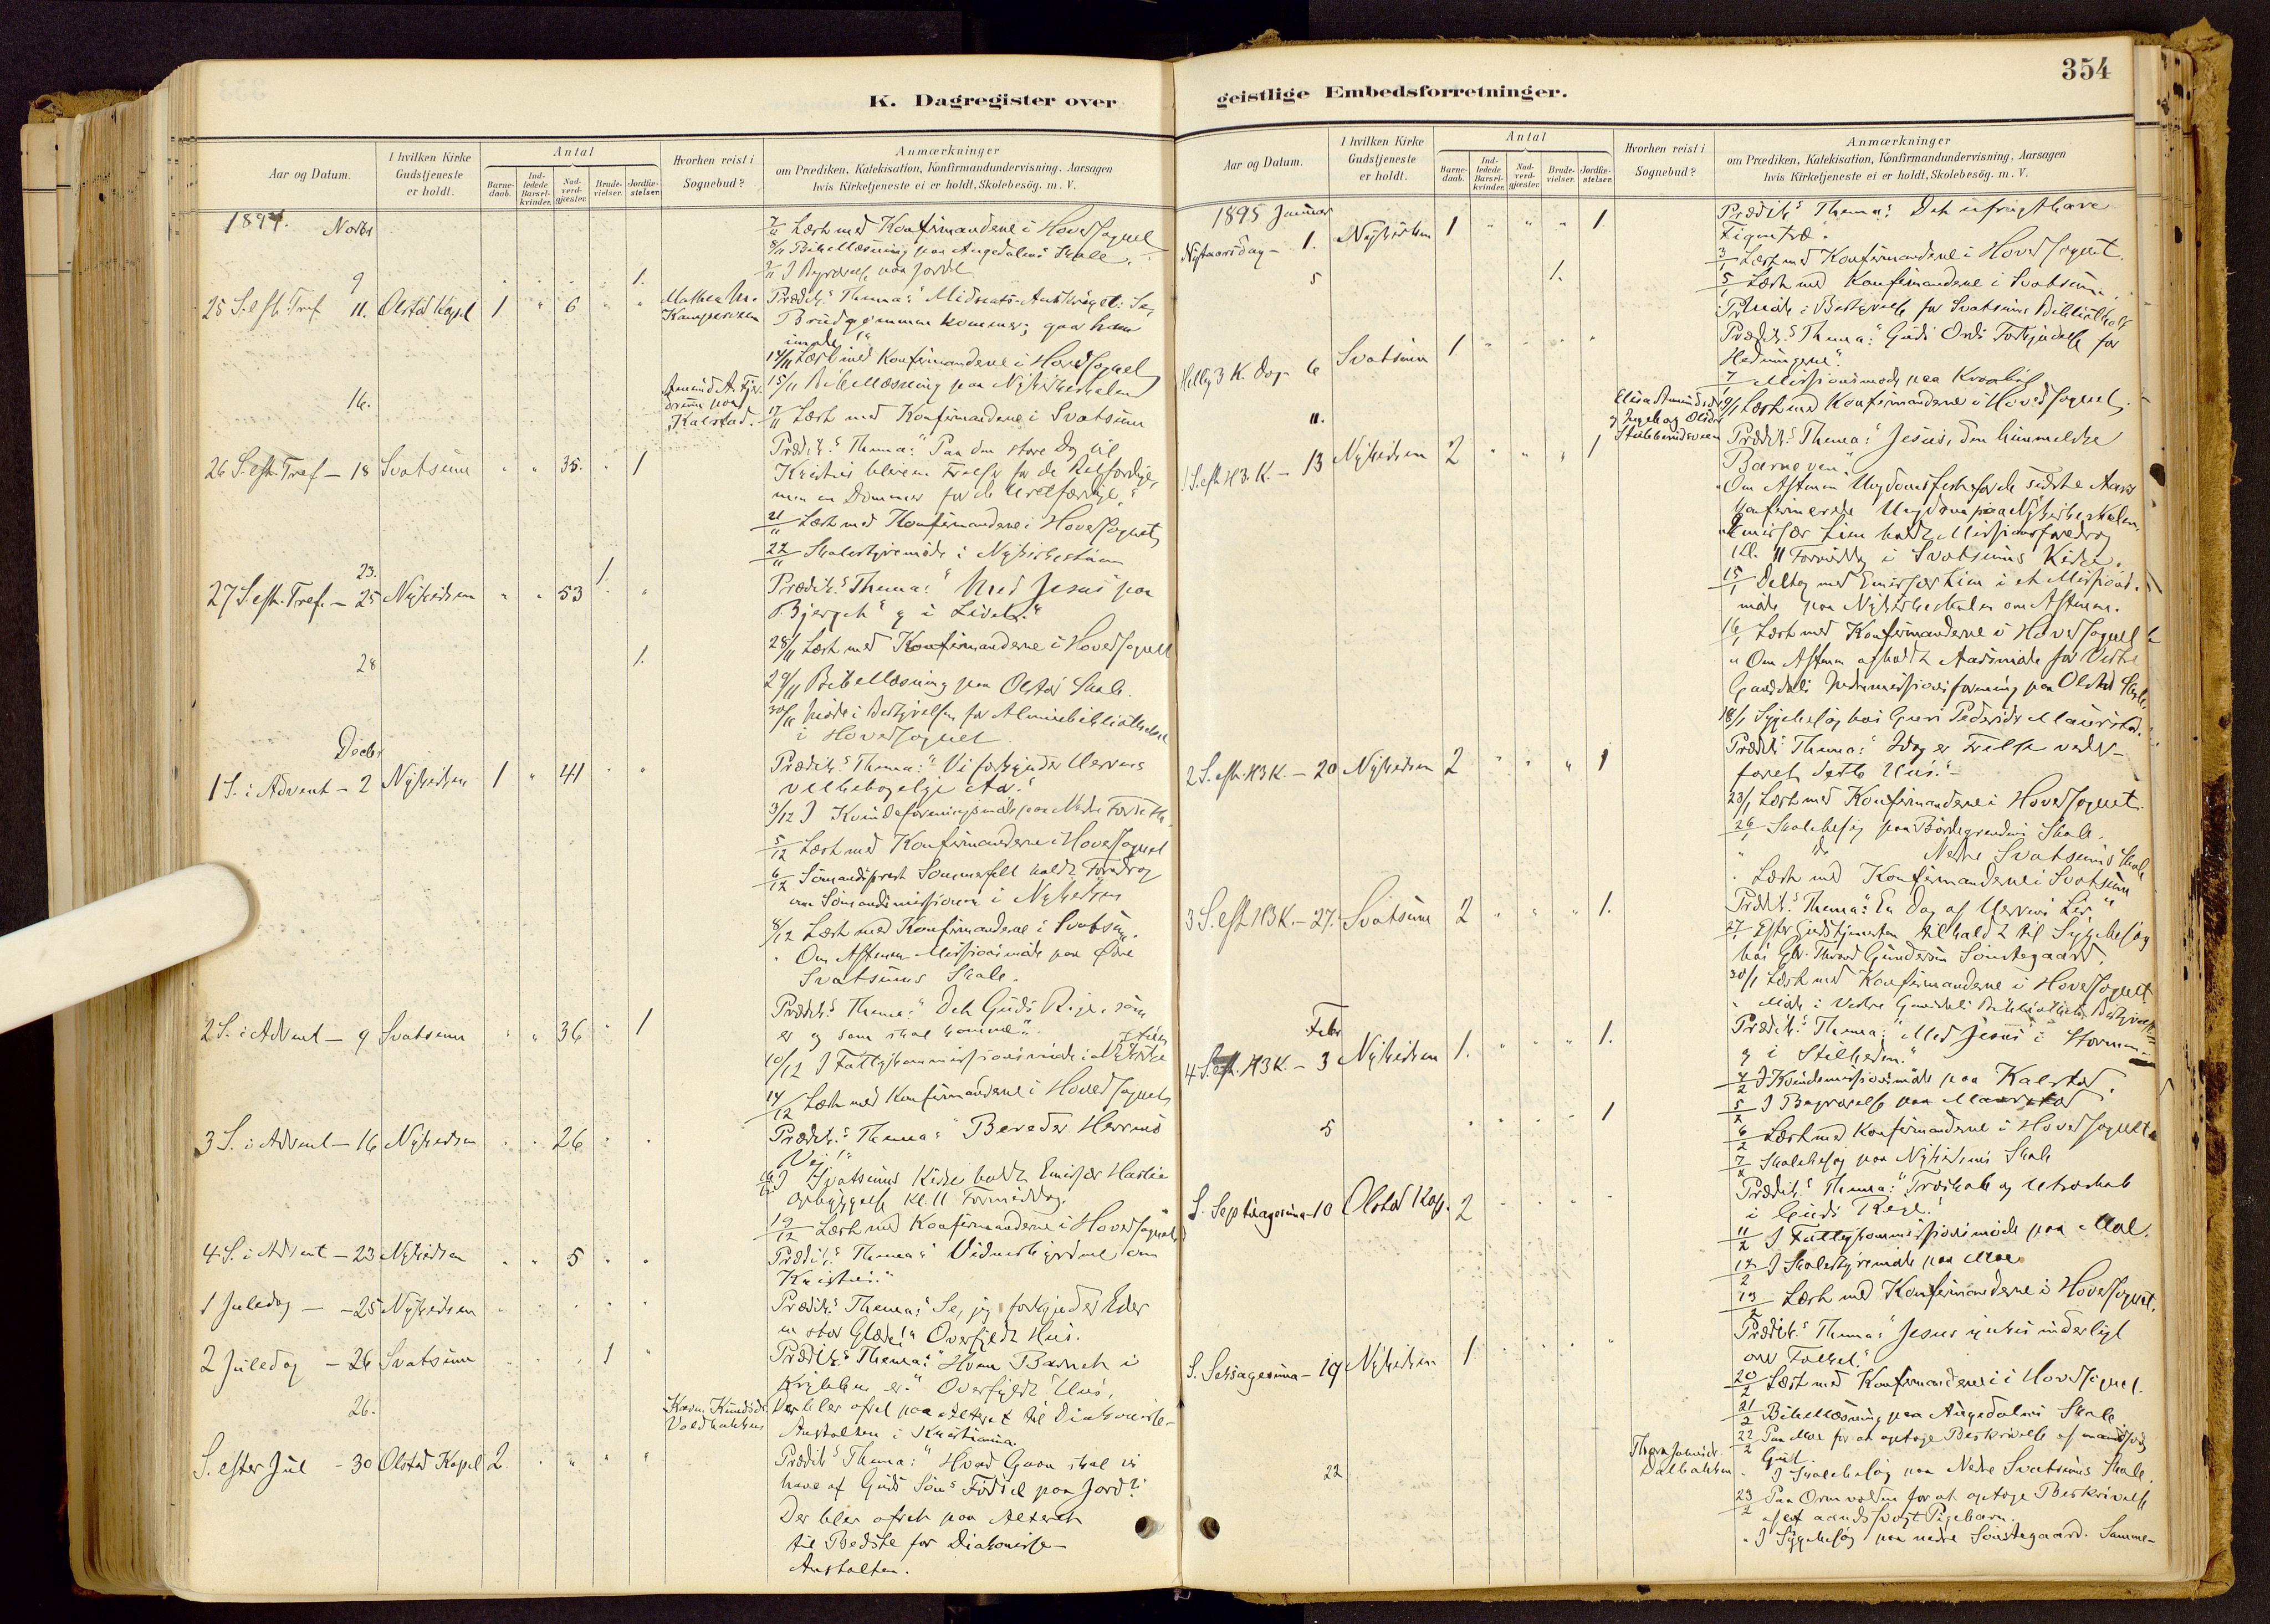 SAH, Vestre Gausdal prestekontor, Ministerialbok nr. 1, 1887-1914, s. 354